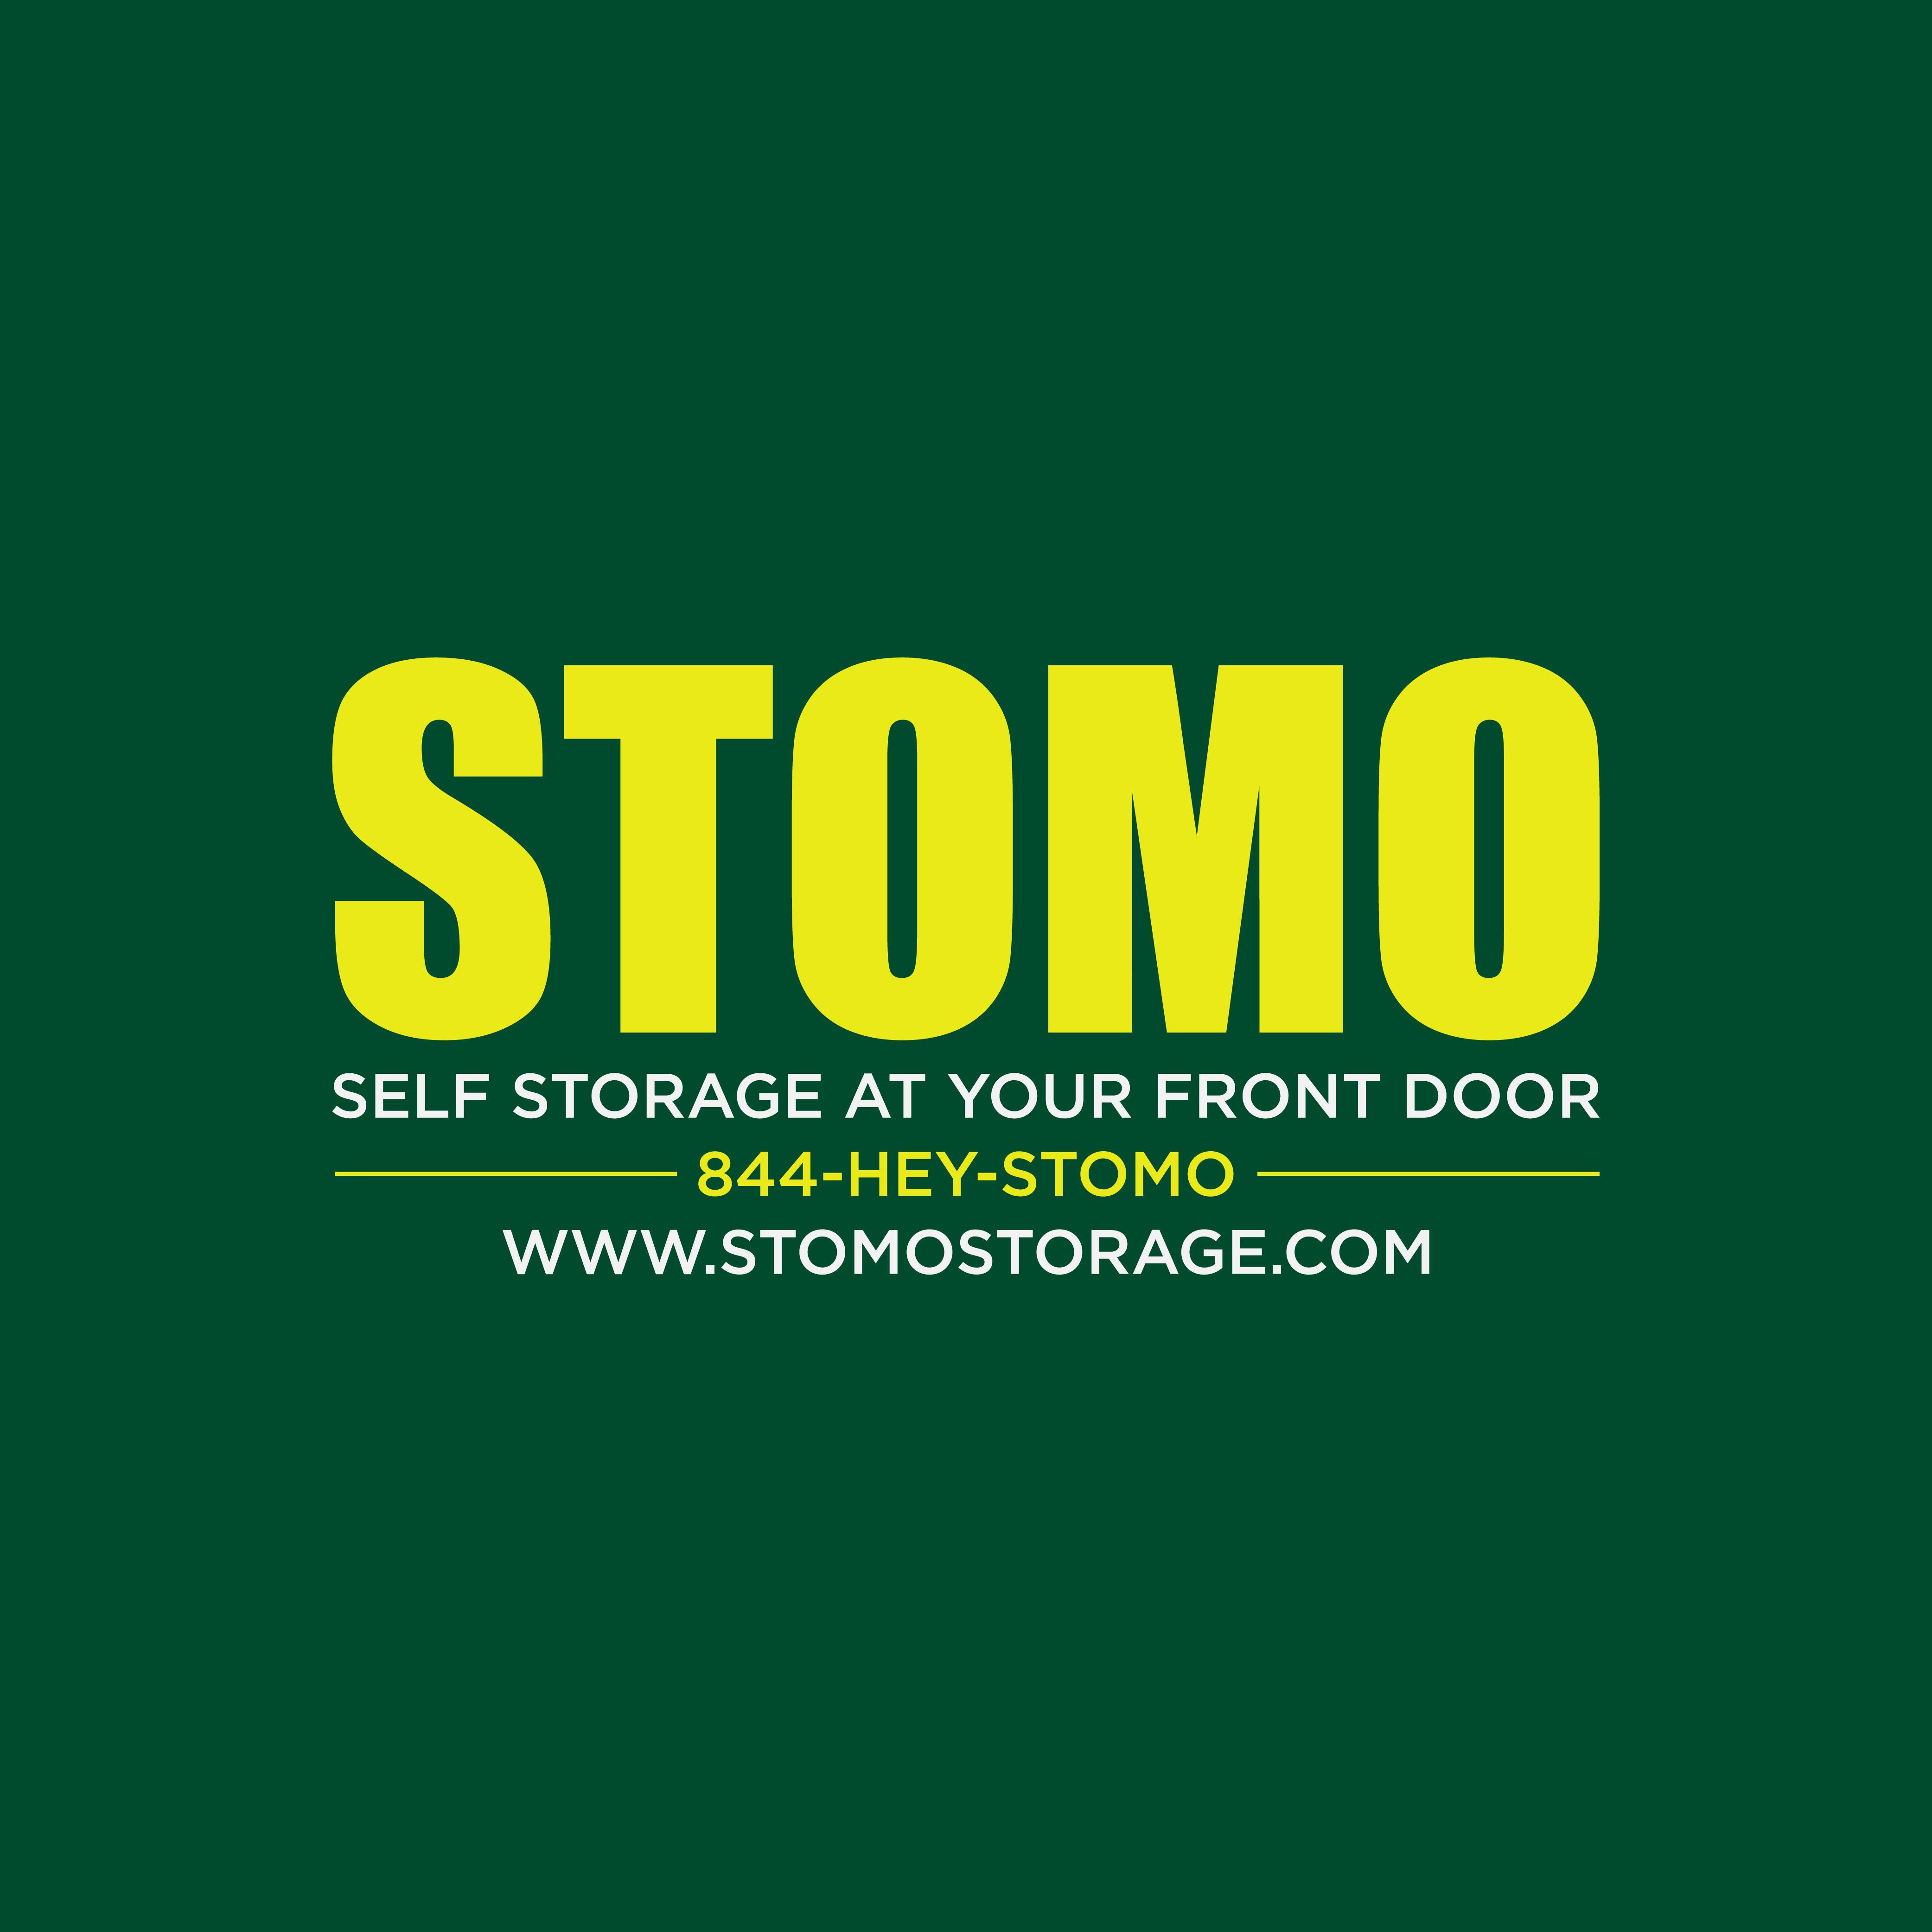 Stomo Mobile Self Storage Summerville South Carolina Sc